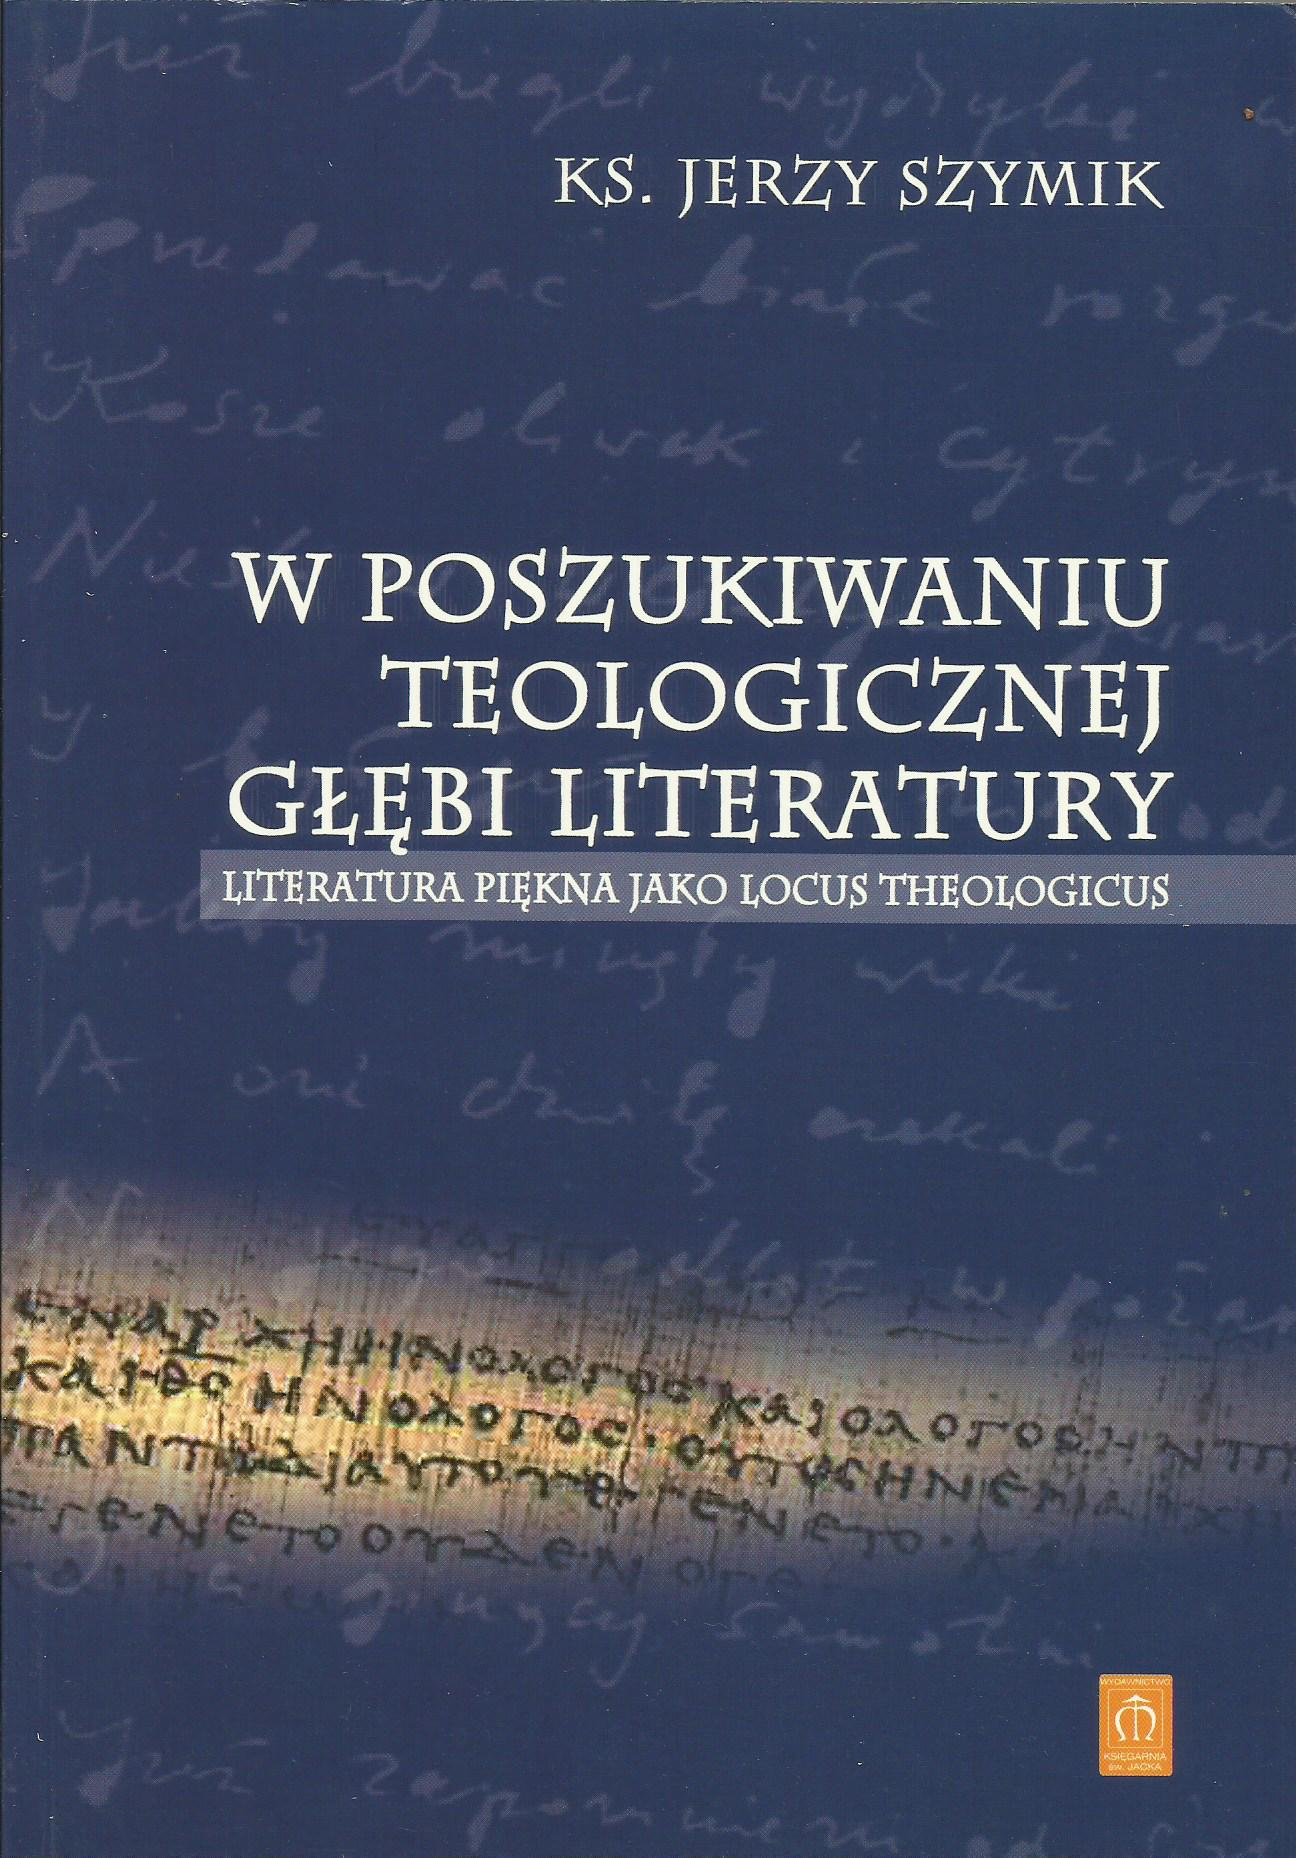 W poszukiwaniu teologicznej głębi literatury. Literatura piękna jako locus theologicus